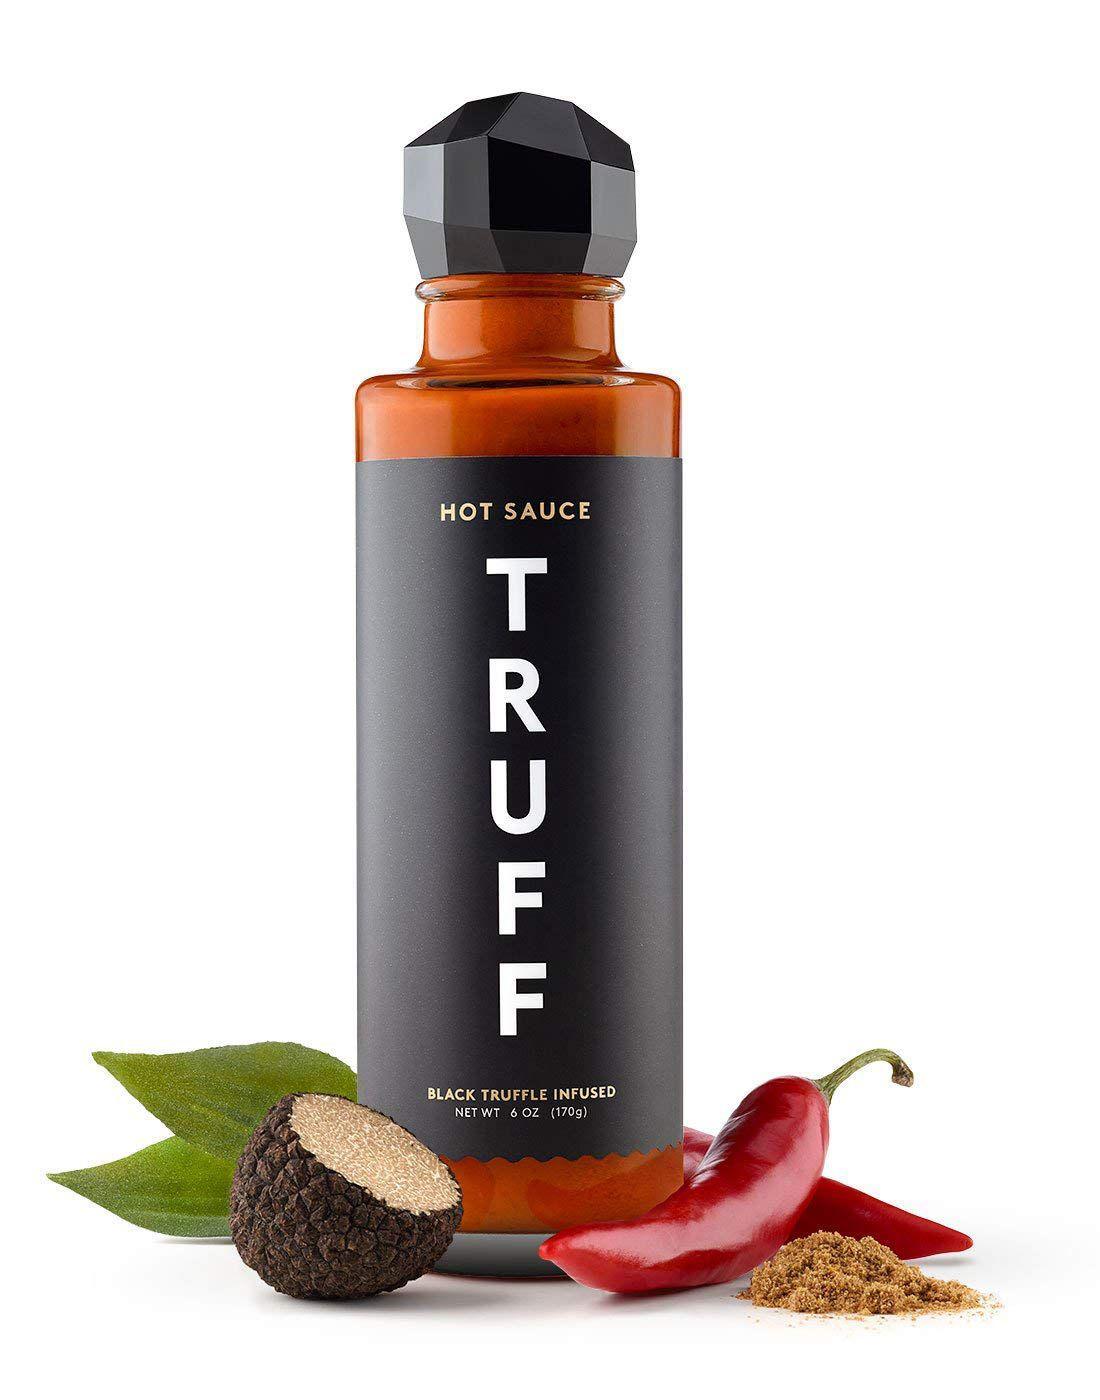 TRUFF Truffle-Infused Hot Sauce